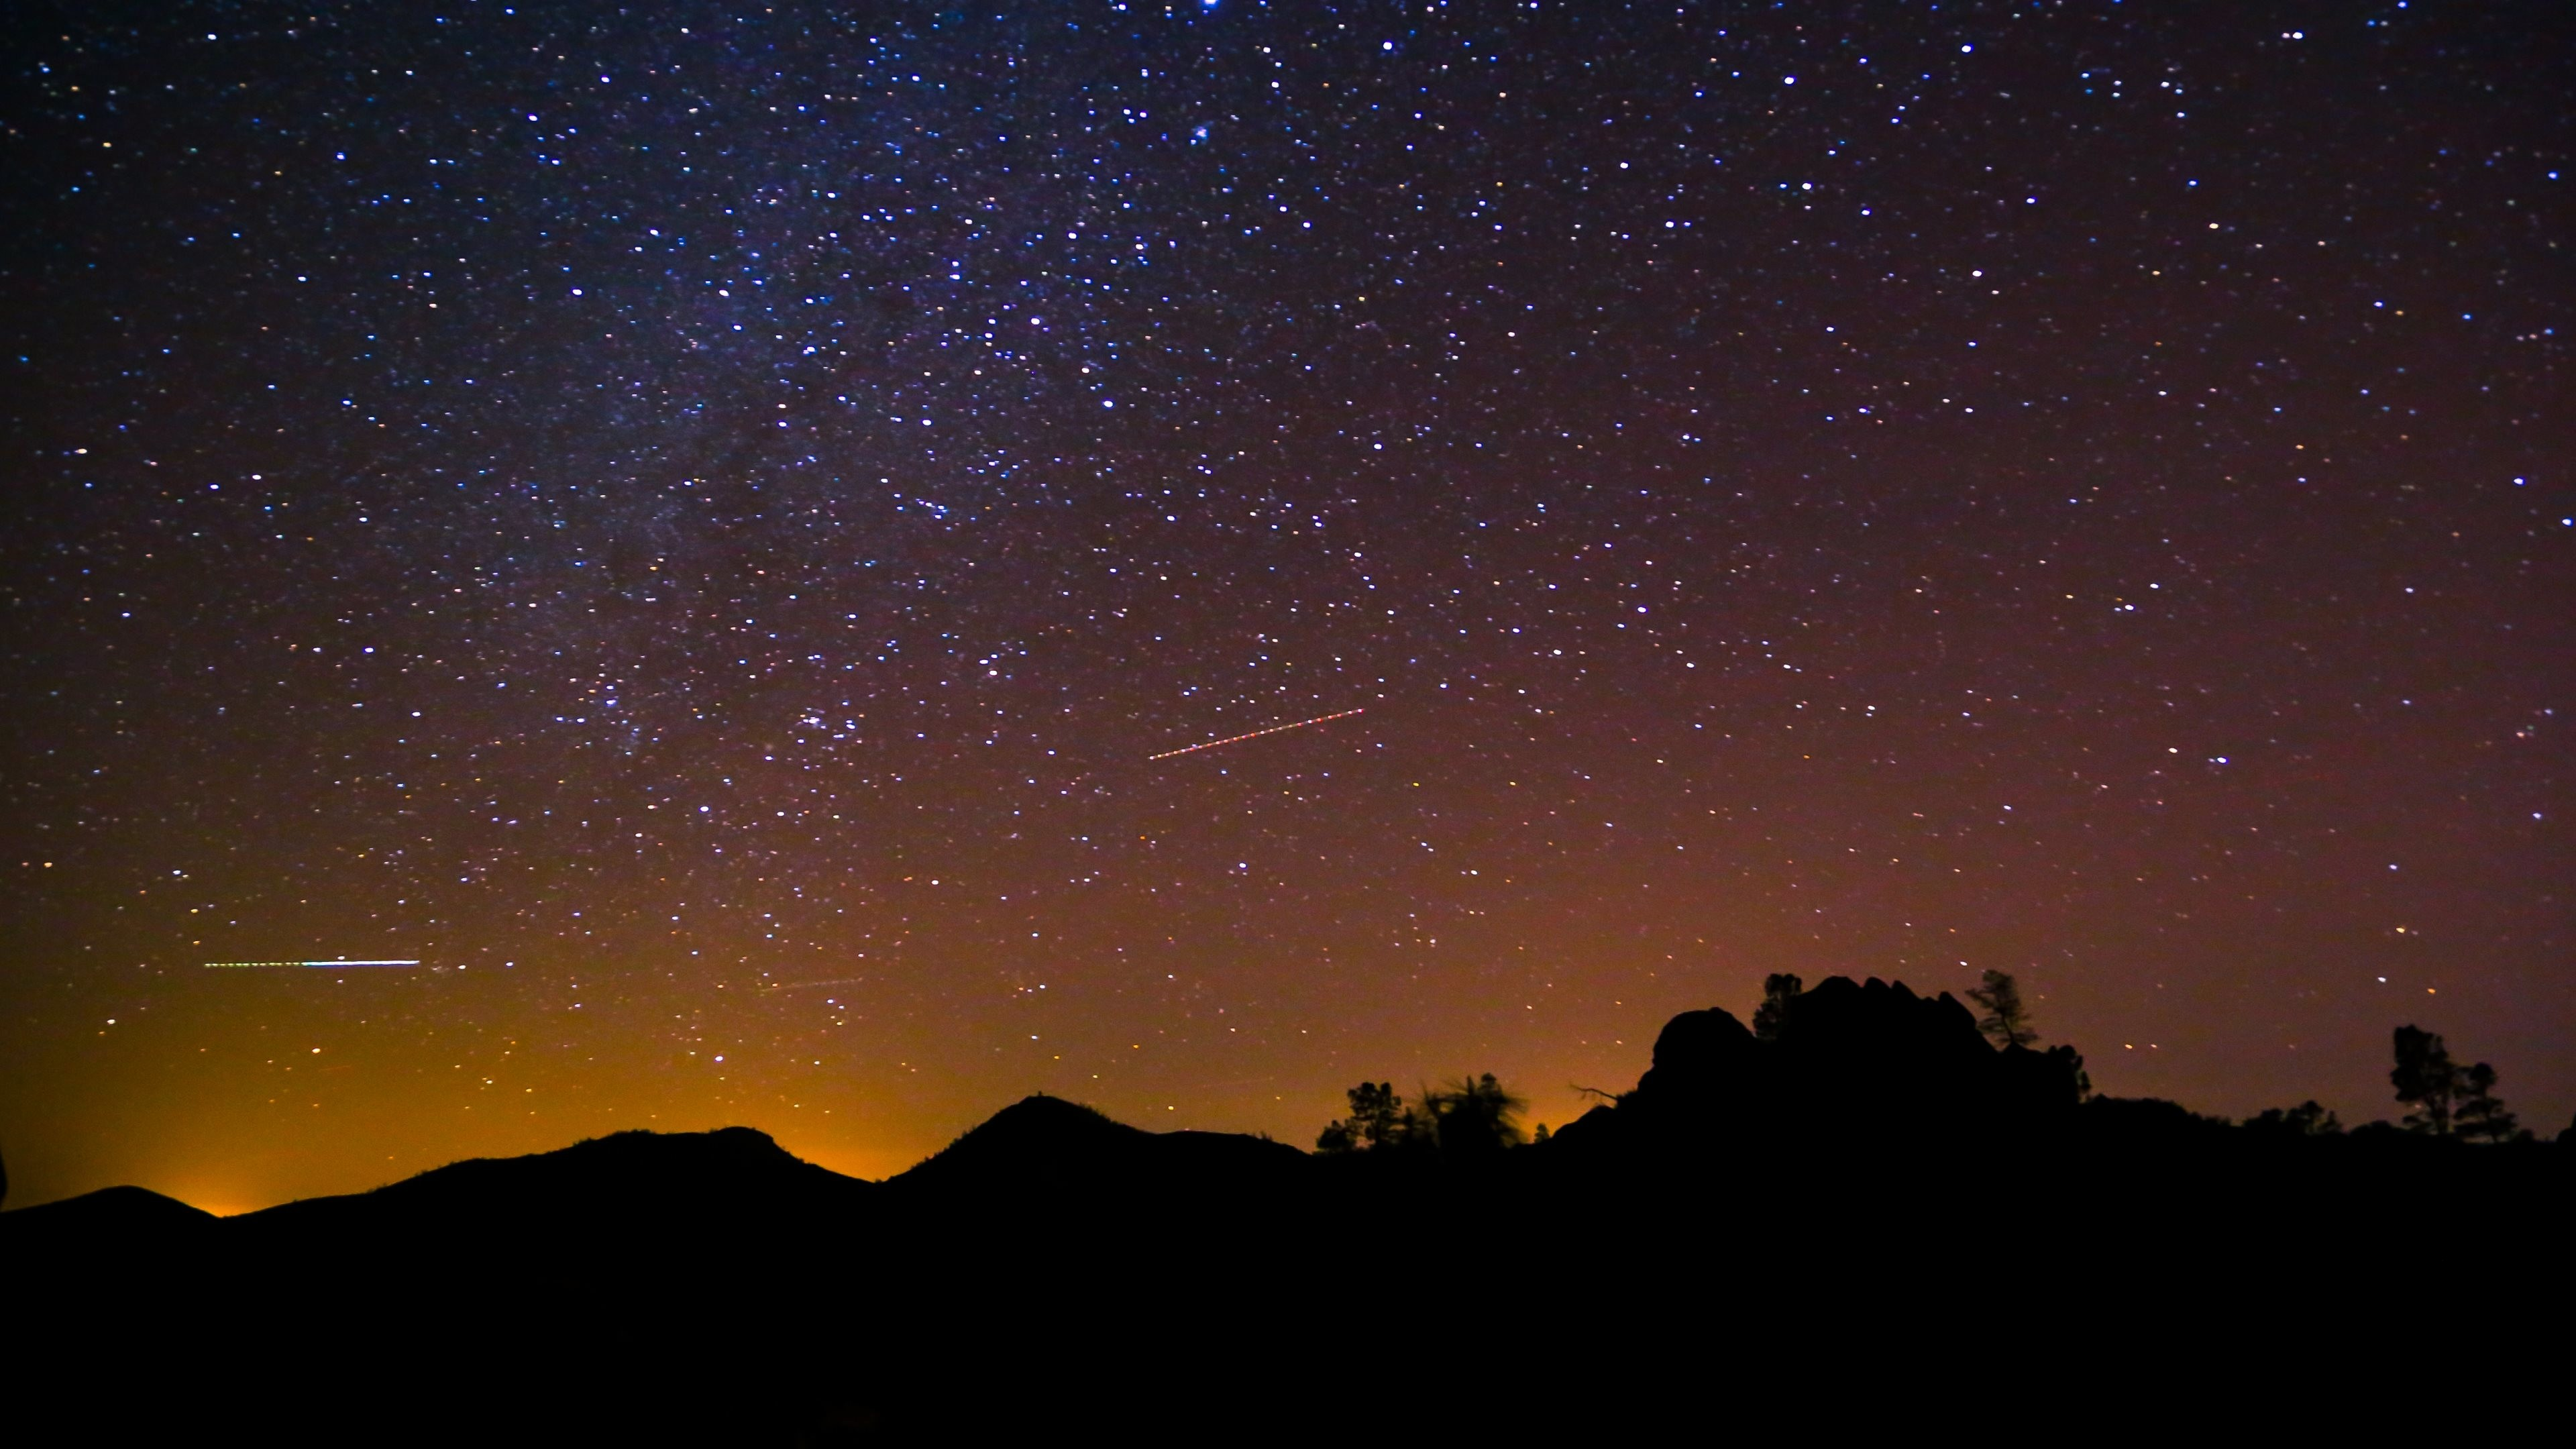 4K HD Wallpaper: Stars on the night sky